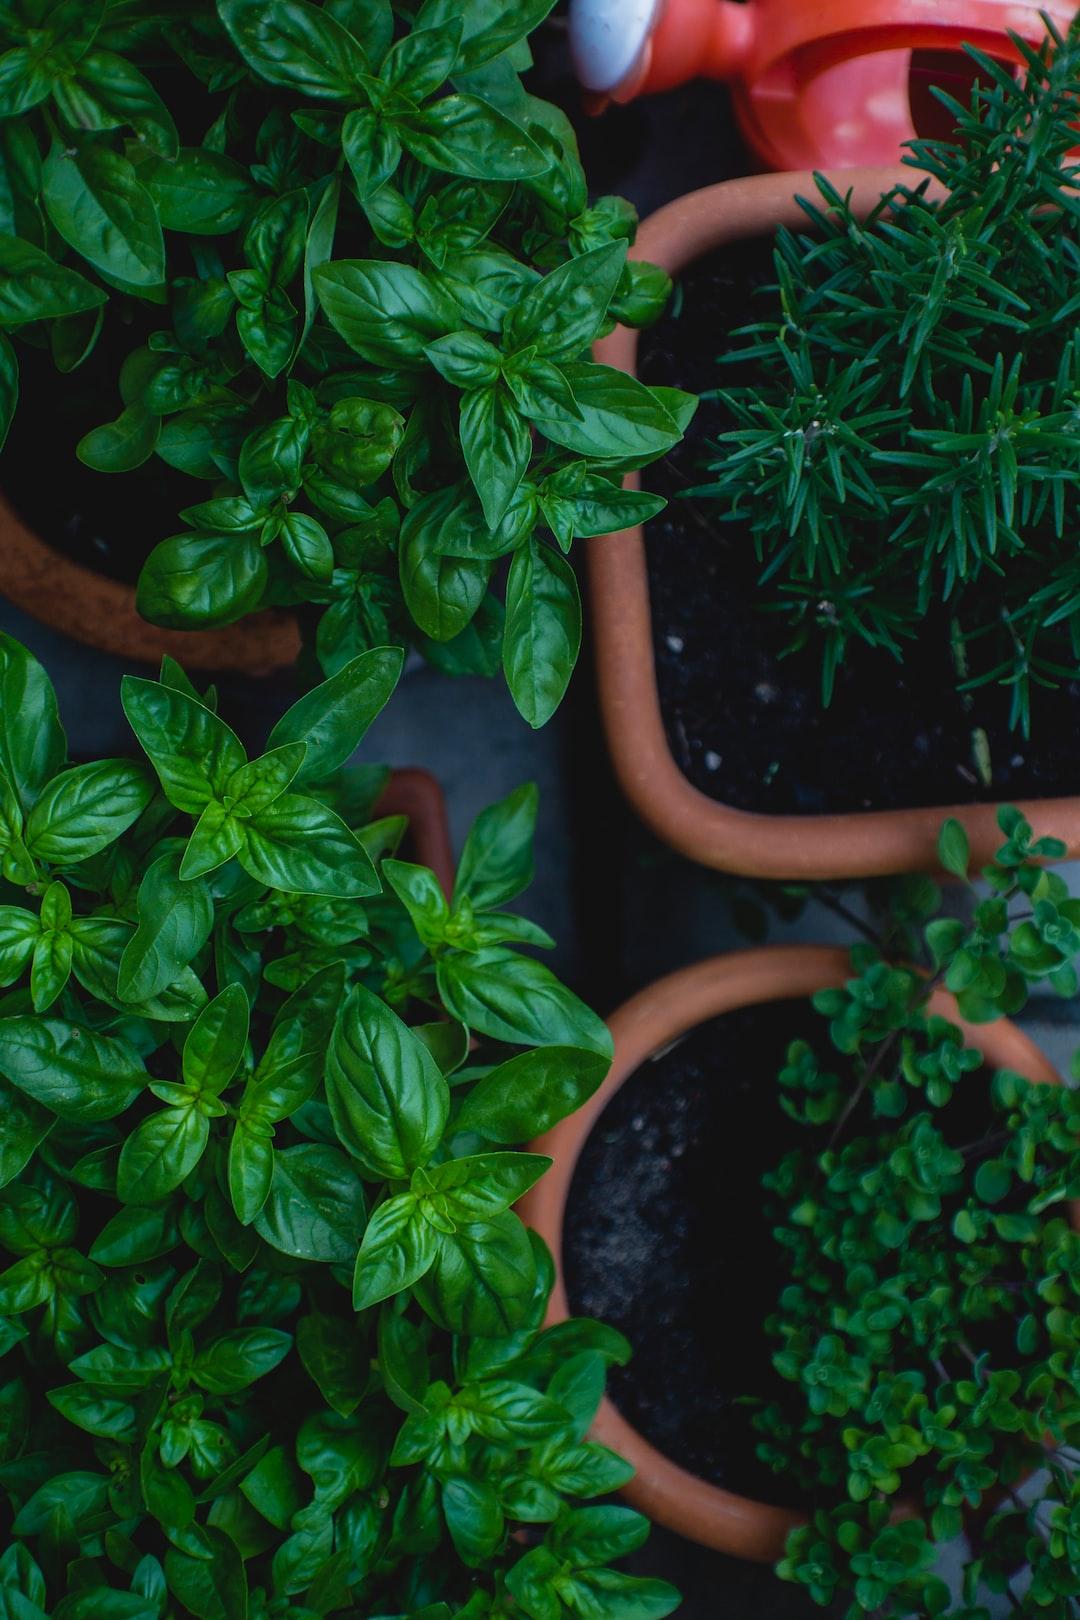 Homegrown herbs, basil and thyme. Urban Gardening & Self-Supply.